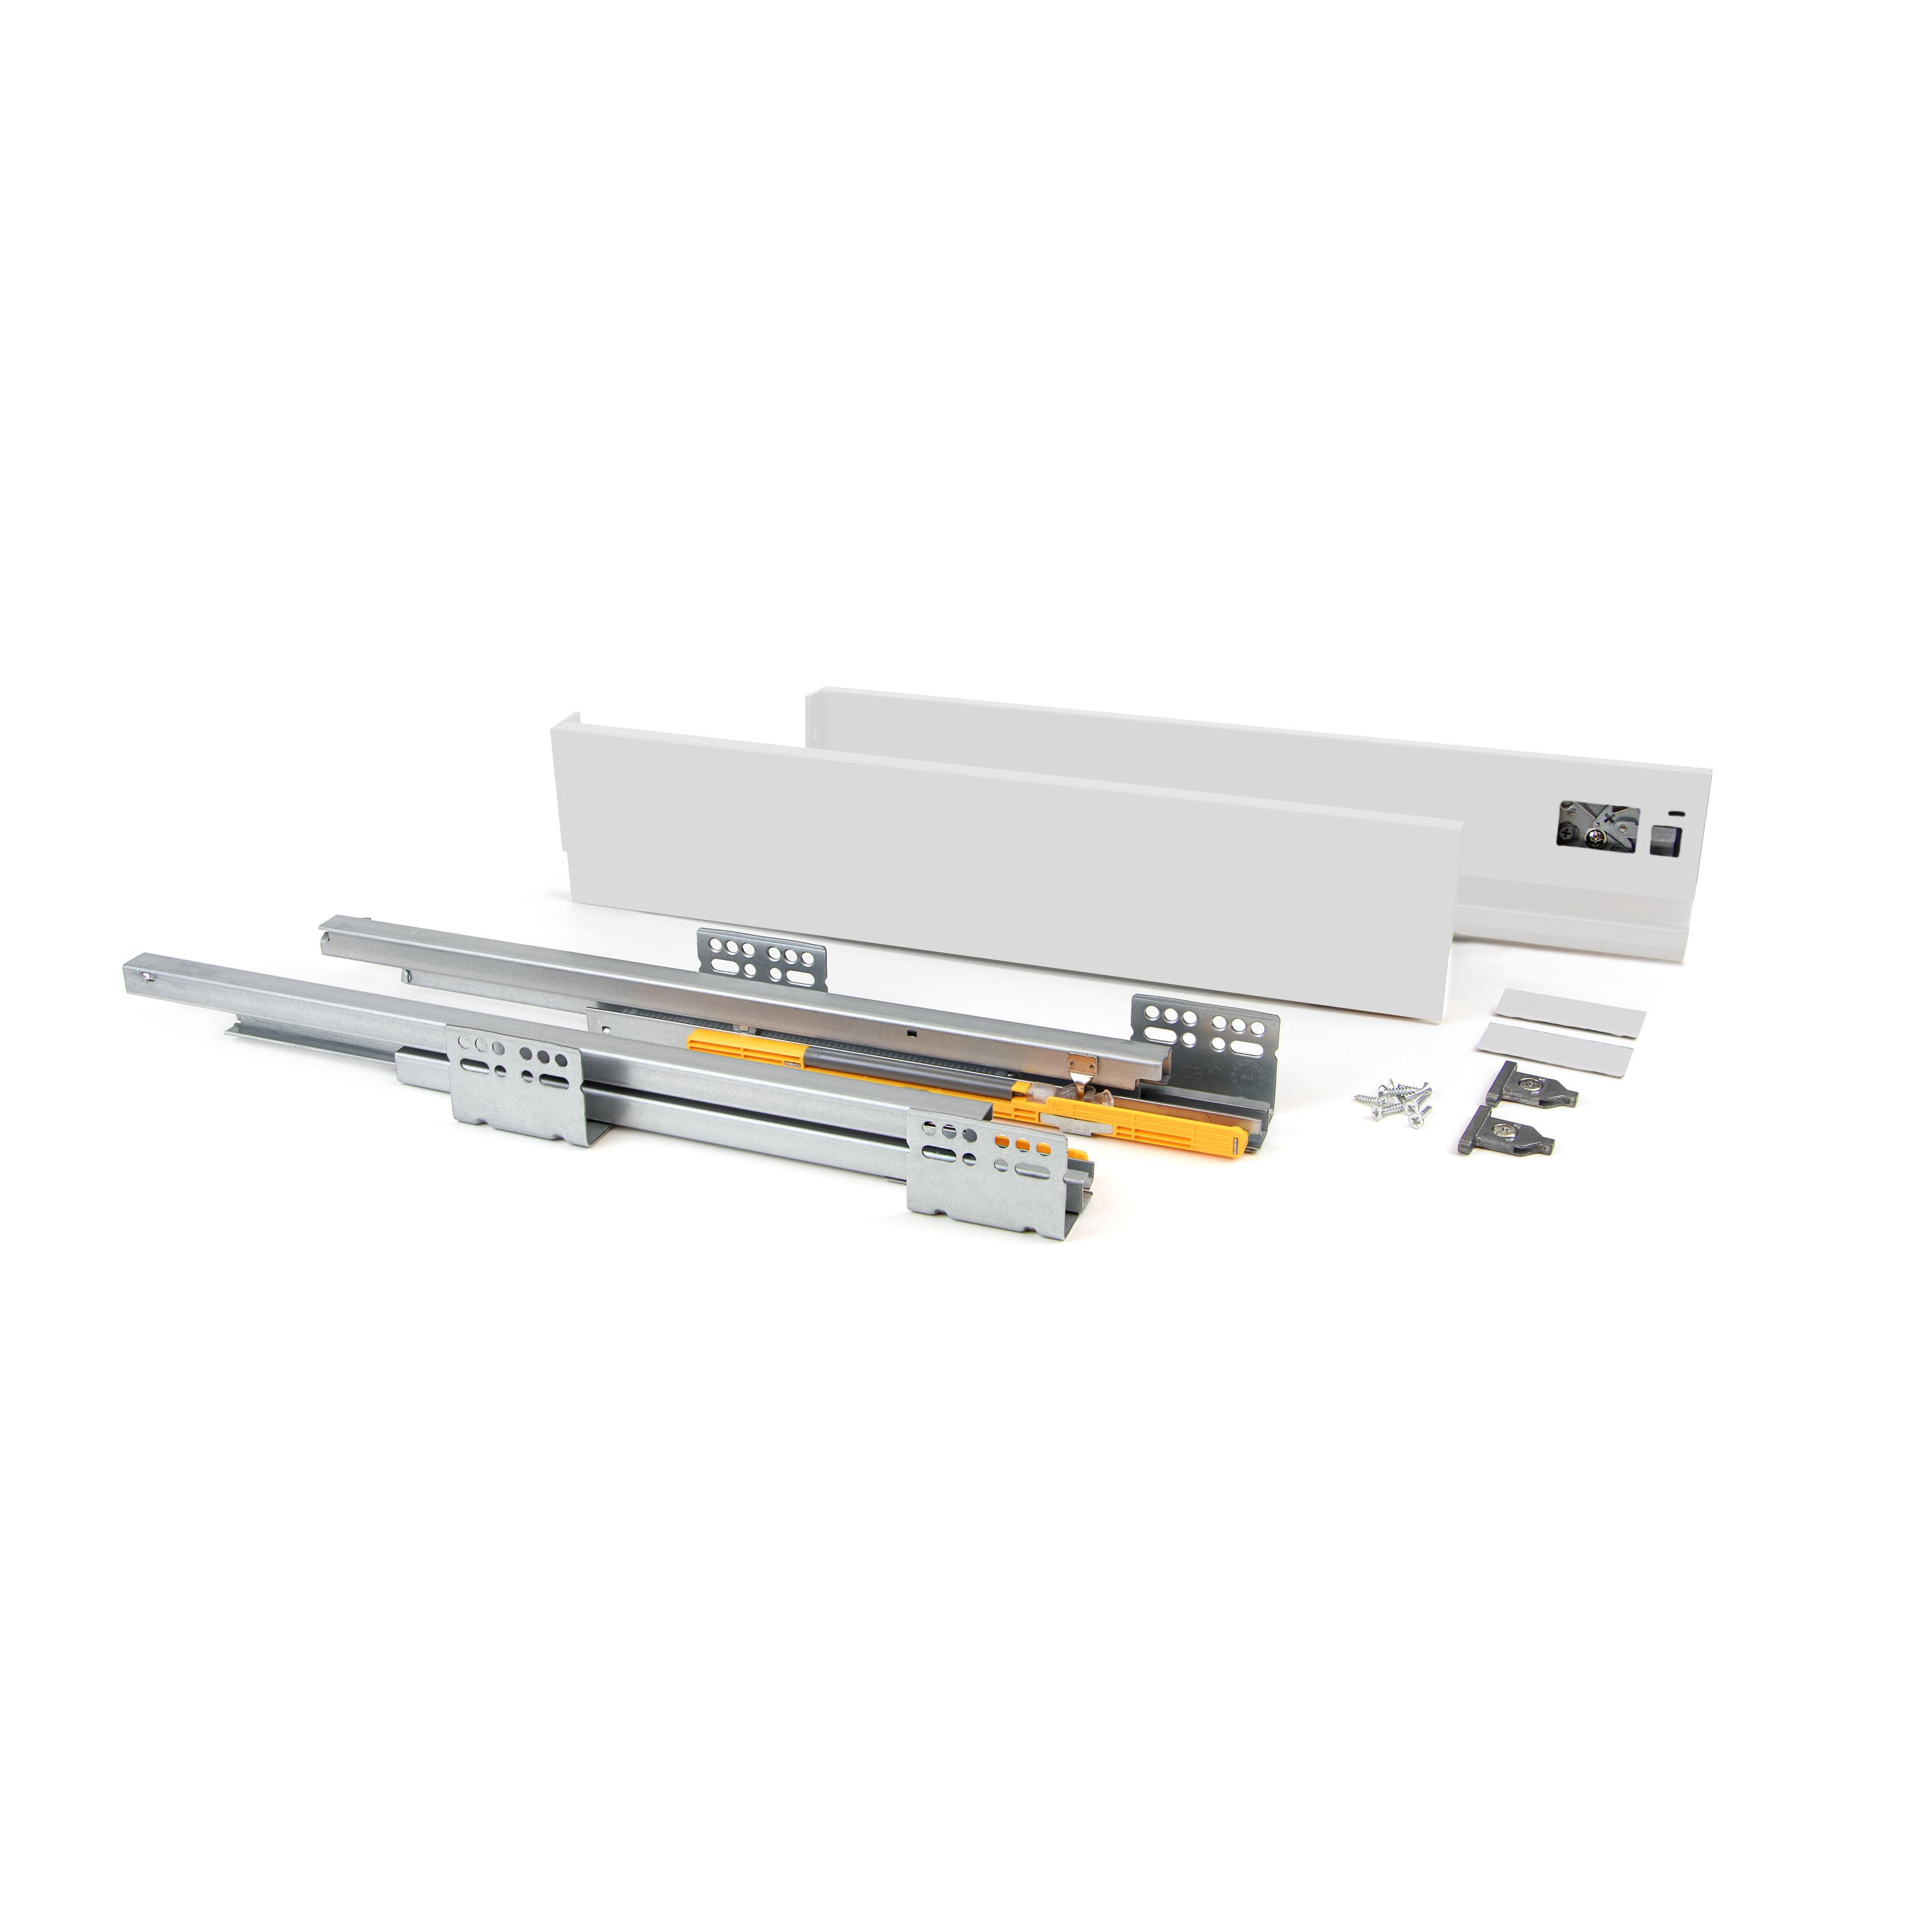 Emuca Kit cassetto per cucina Concept, 50 Kg, altezza 105 mm, prof. 500 mm, chiusura soft, Acciaio, Bianco